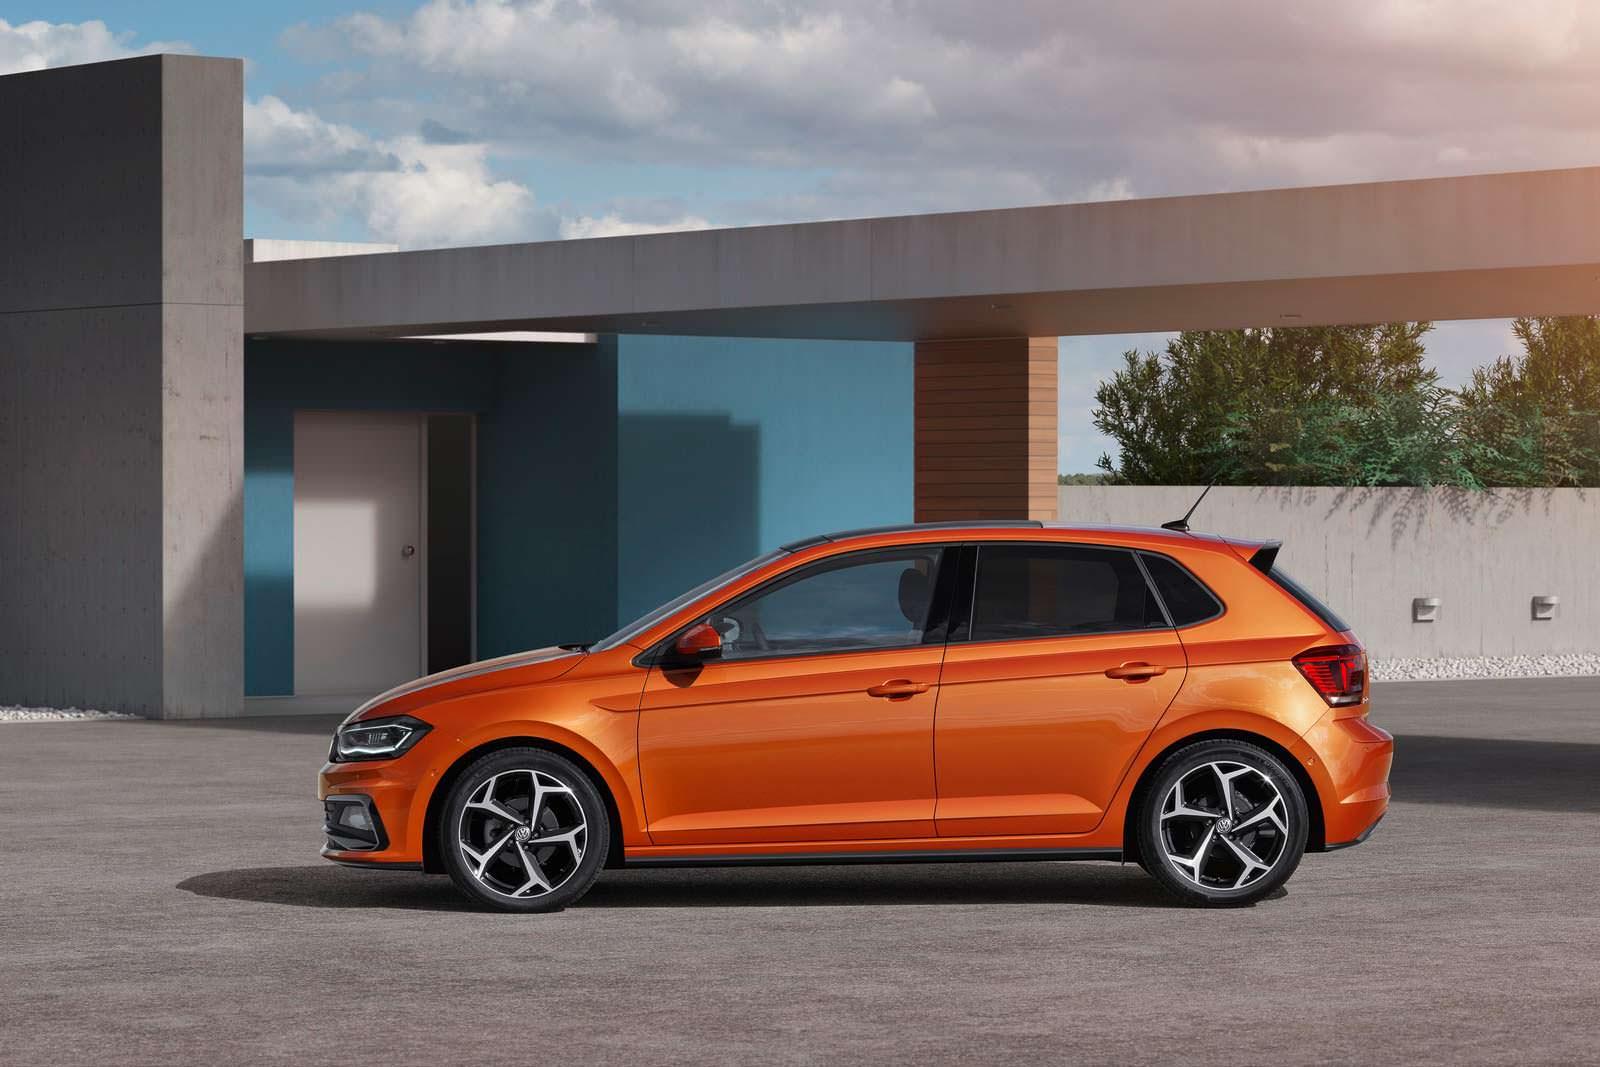 Оранжевый Volkswagen Polo 2018 года